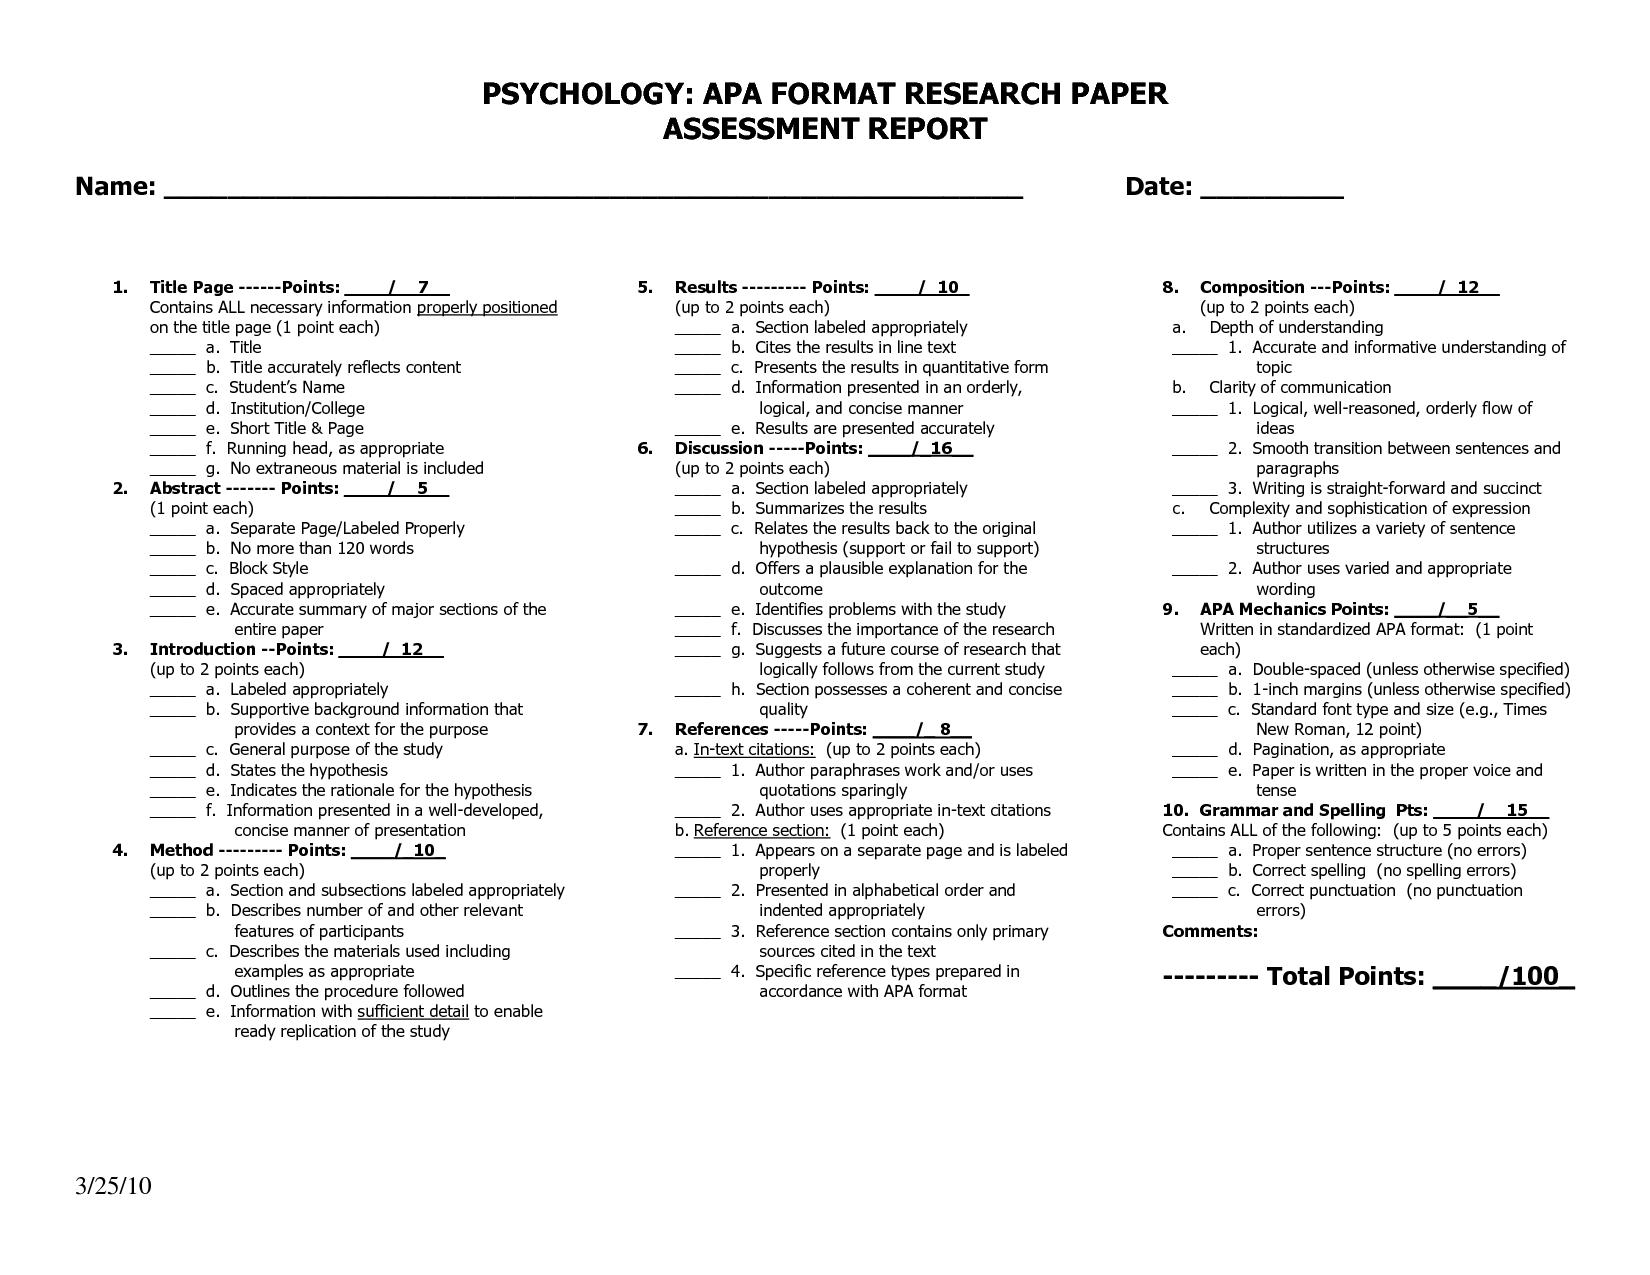 apa format proposal example